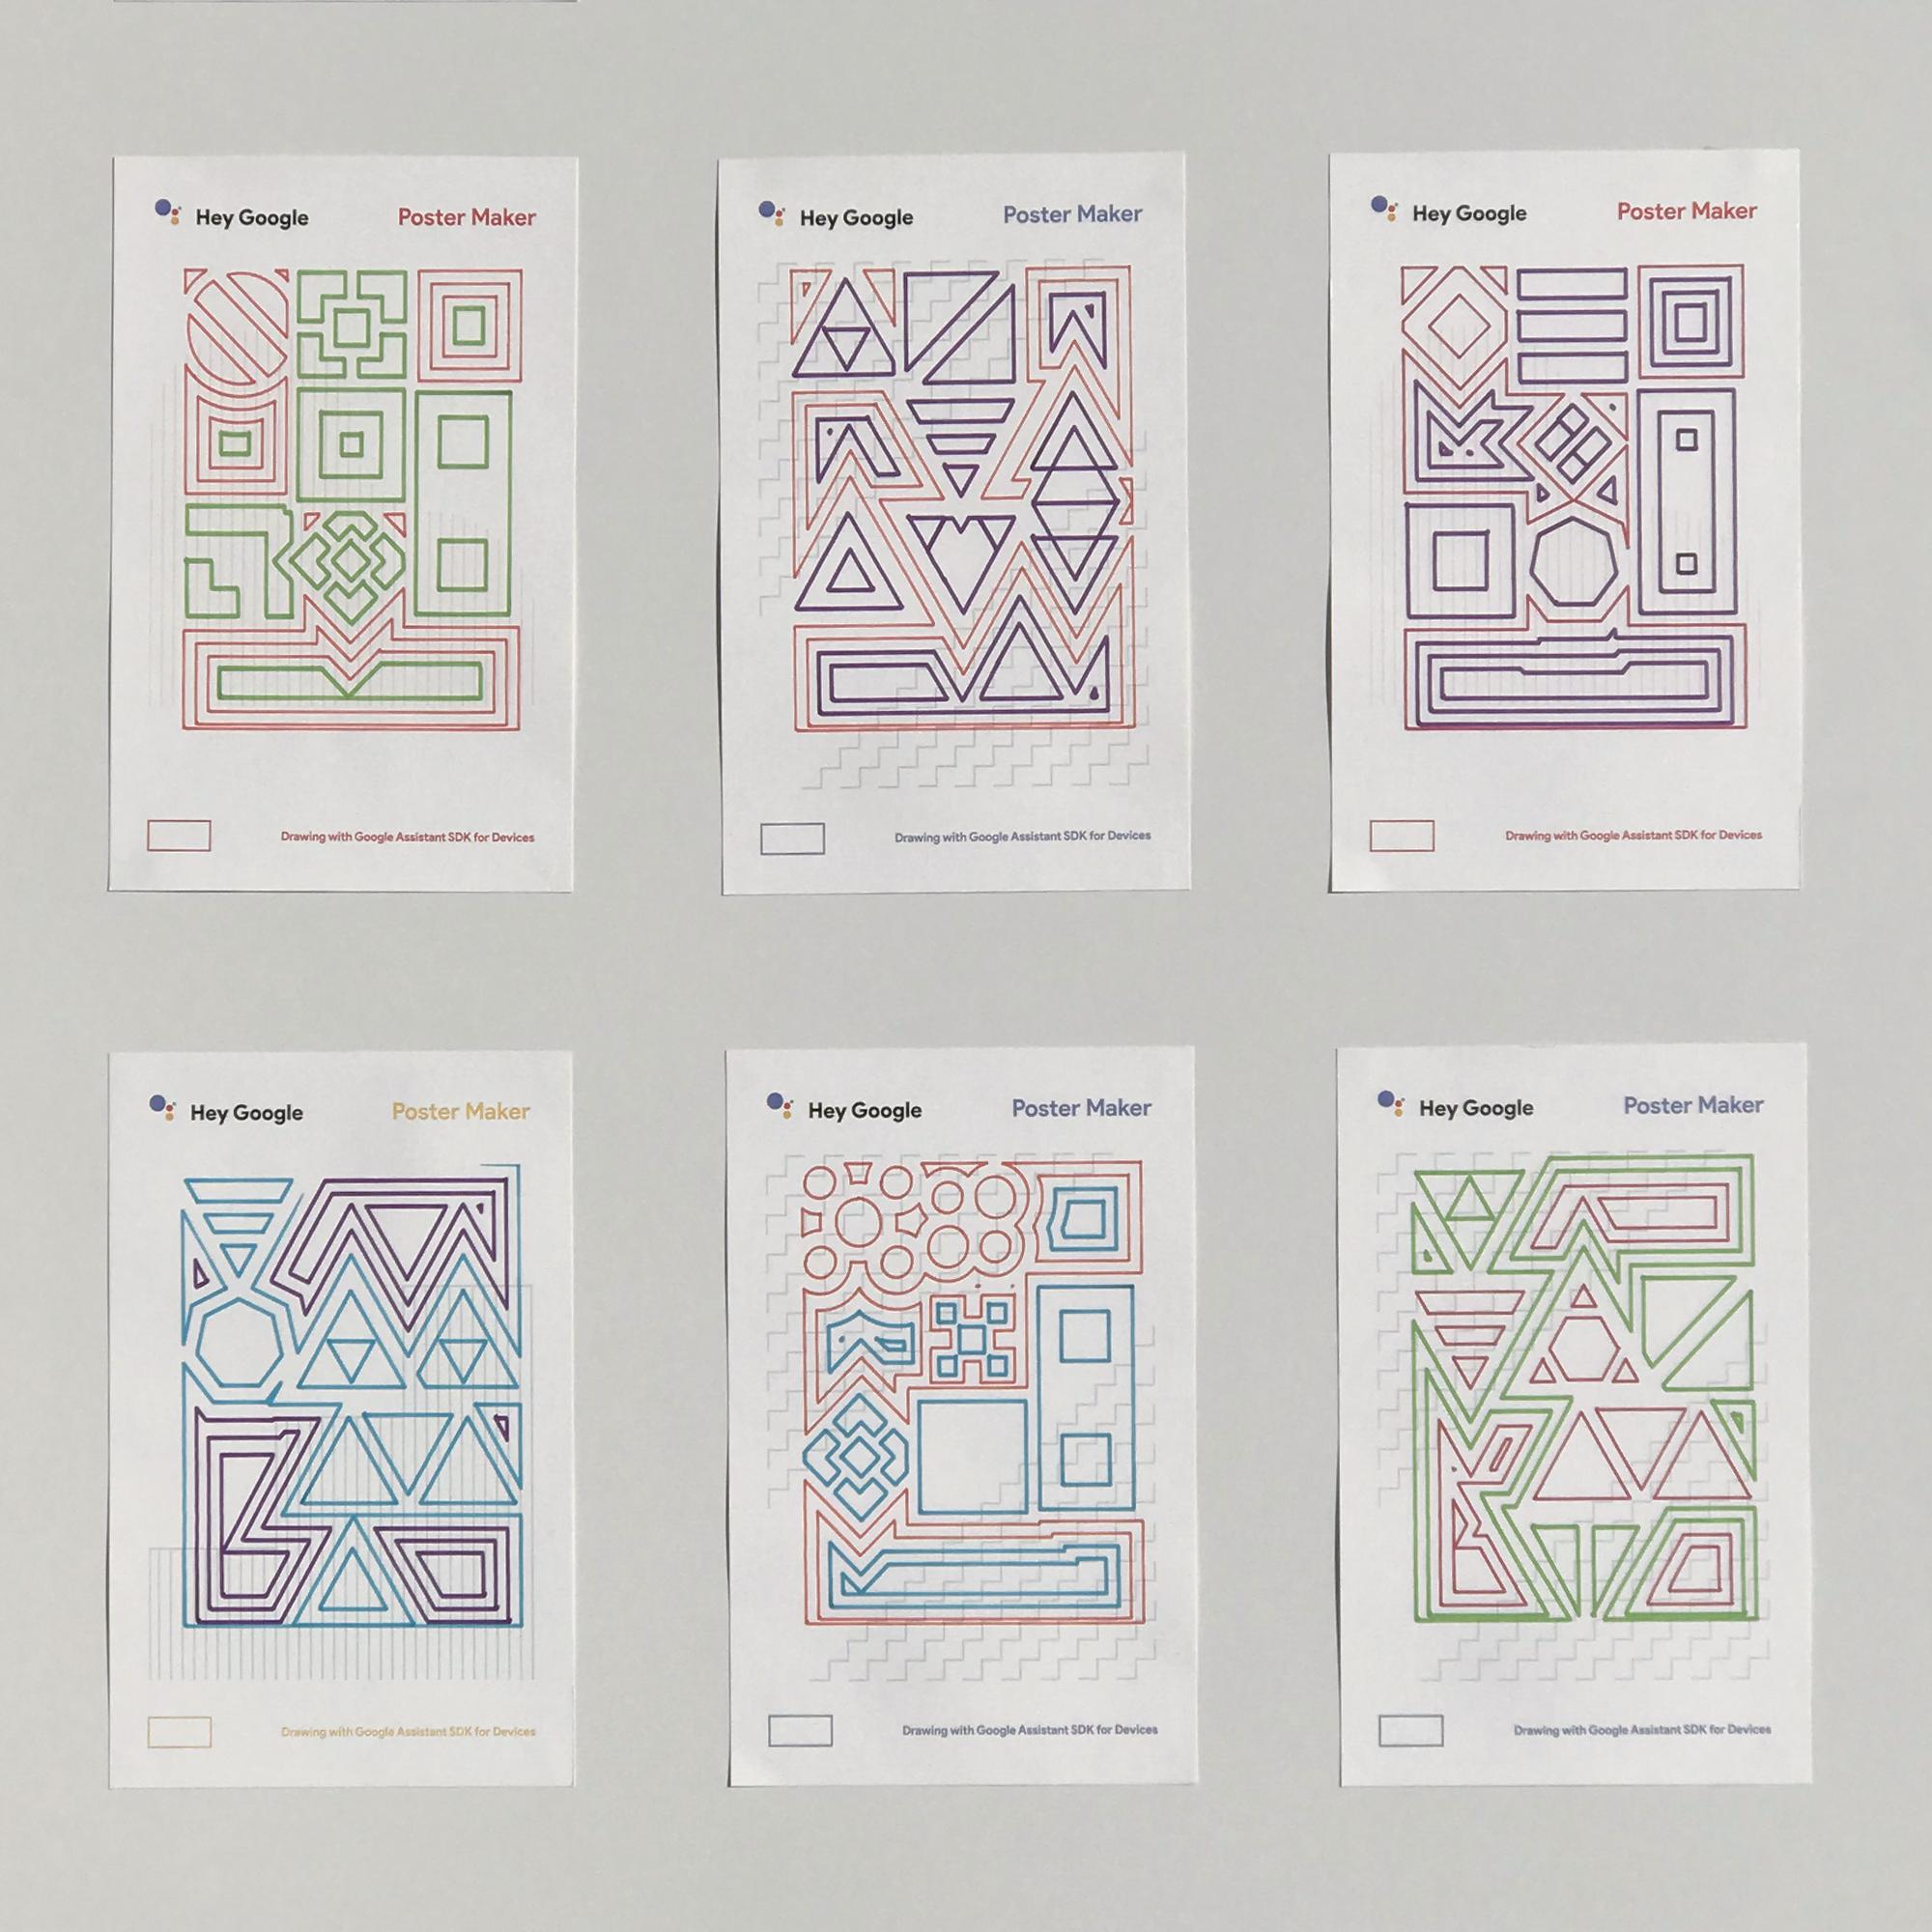 poster_card_4.jpg